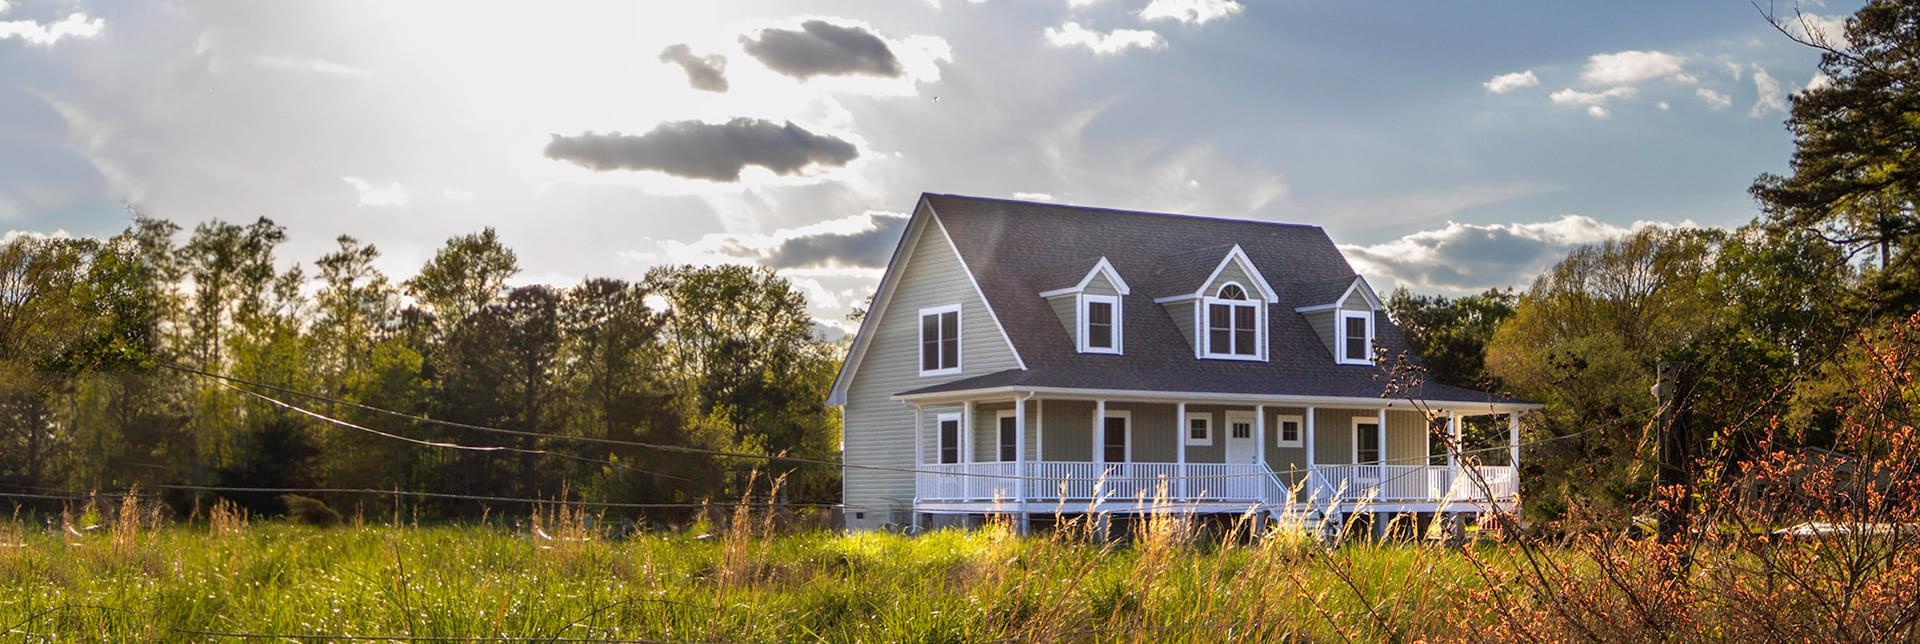 New Homes in City of Alexandria VA